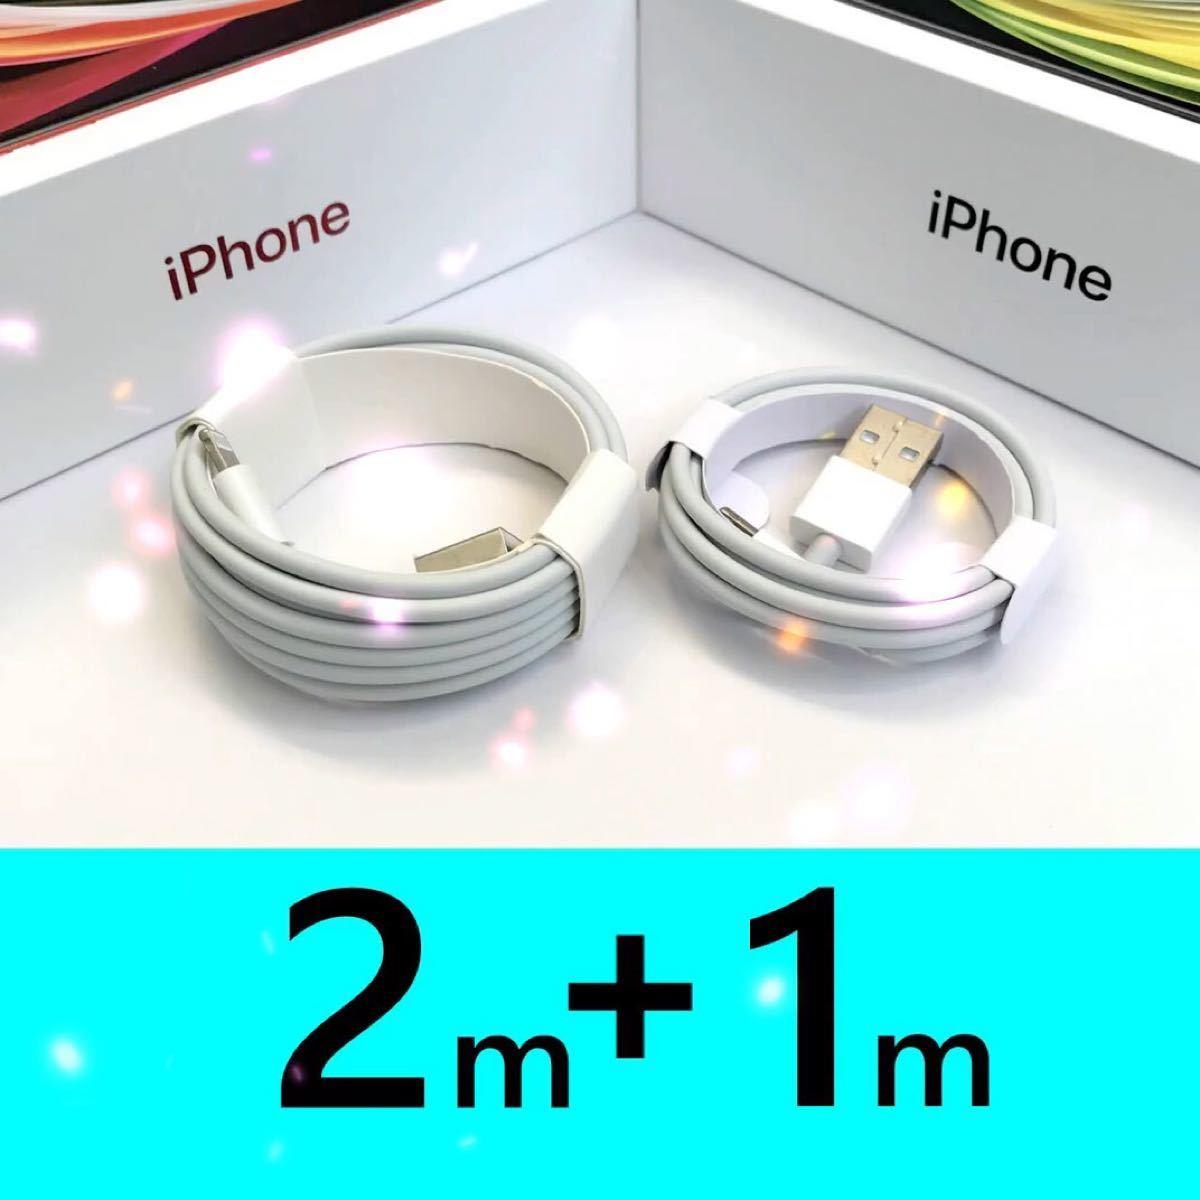 iPhone 充電器 充電ケーブル コード lightning cable ライトニングケーブル 高速充電 急速充電 データ転送